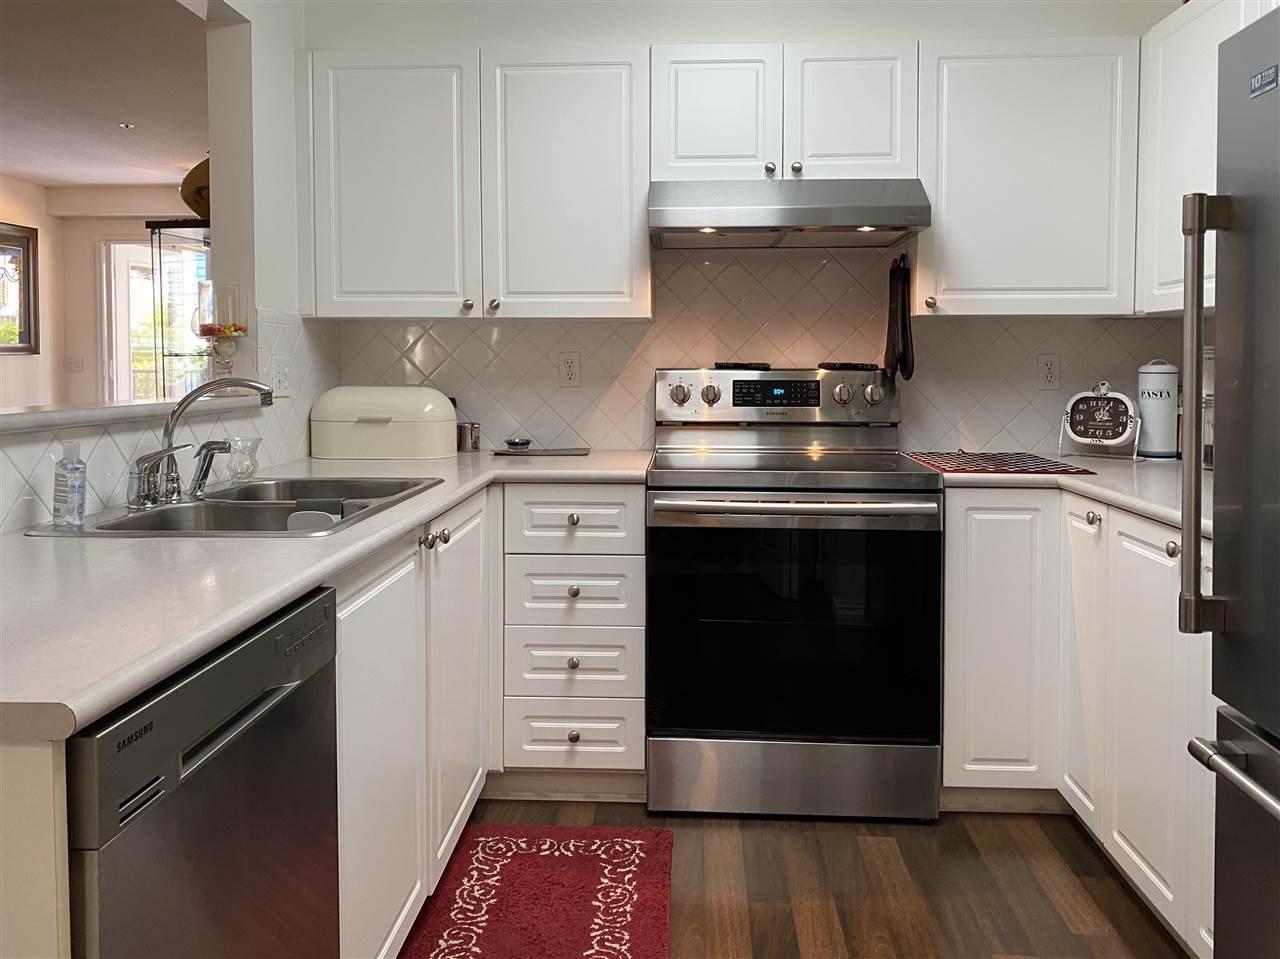 Photo 11: Photos: 304 1369 56 STREET in Delta: Cliff Drive Condo for sale (Tsawwassen)  : MLS®# R2464890